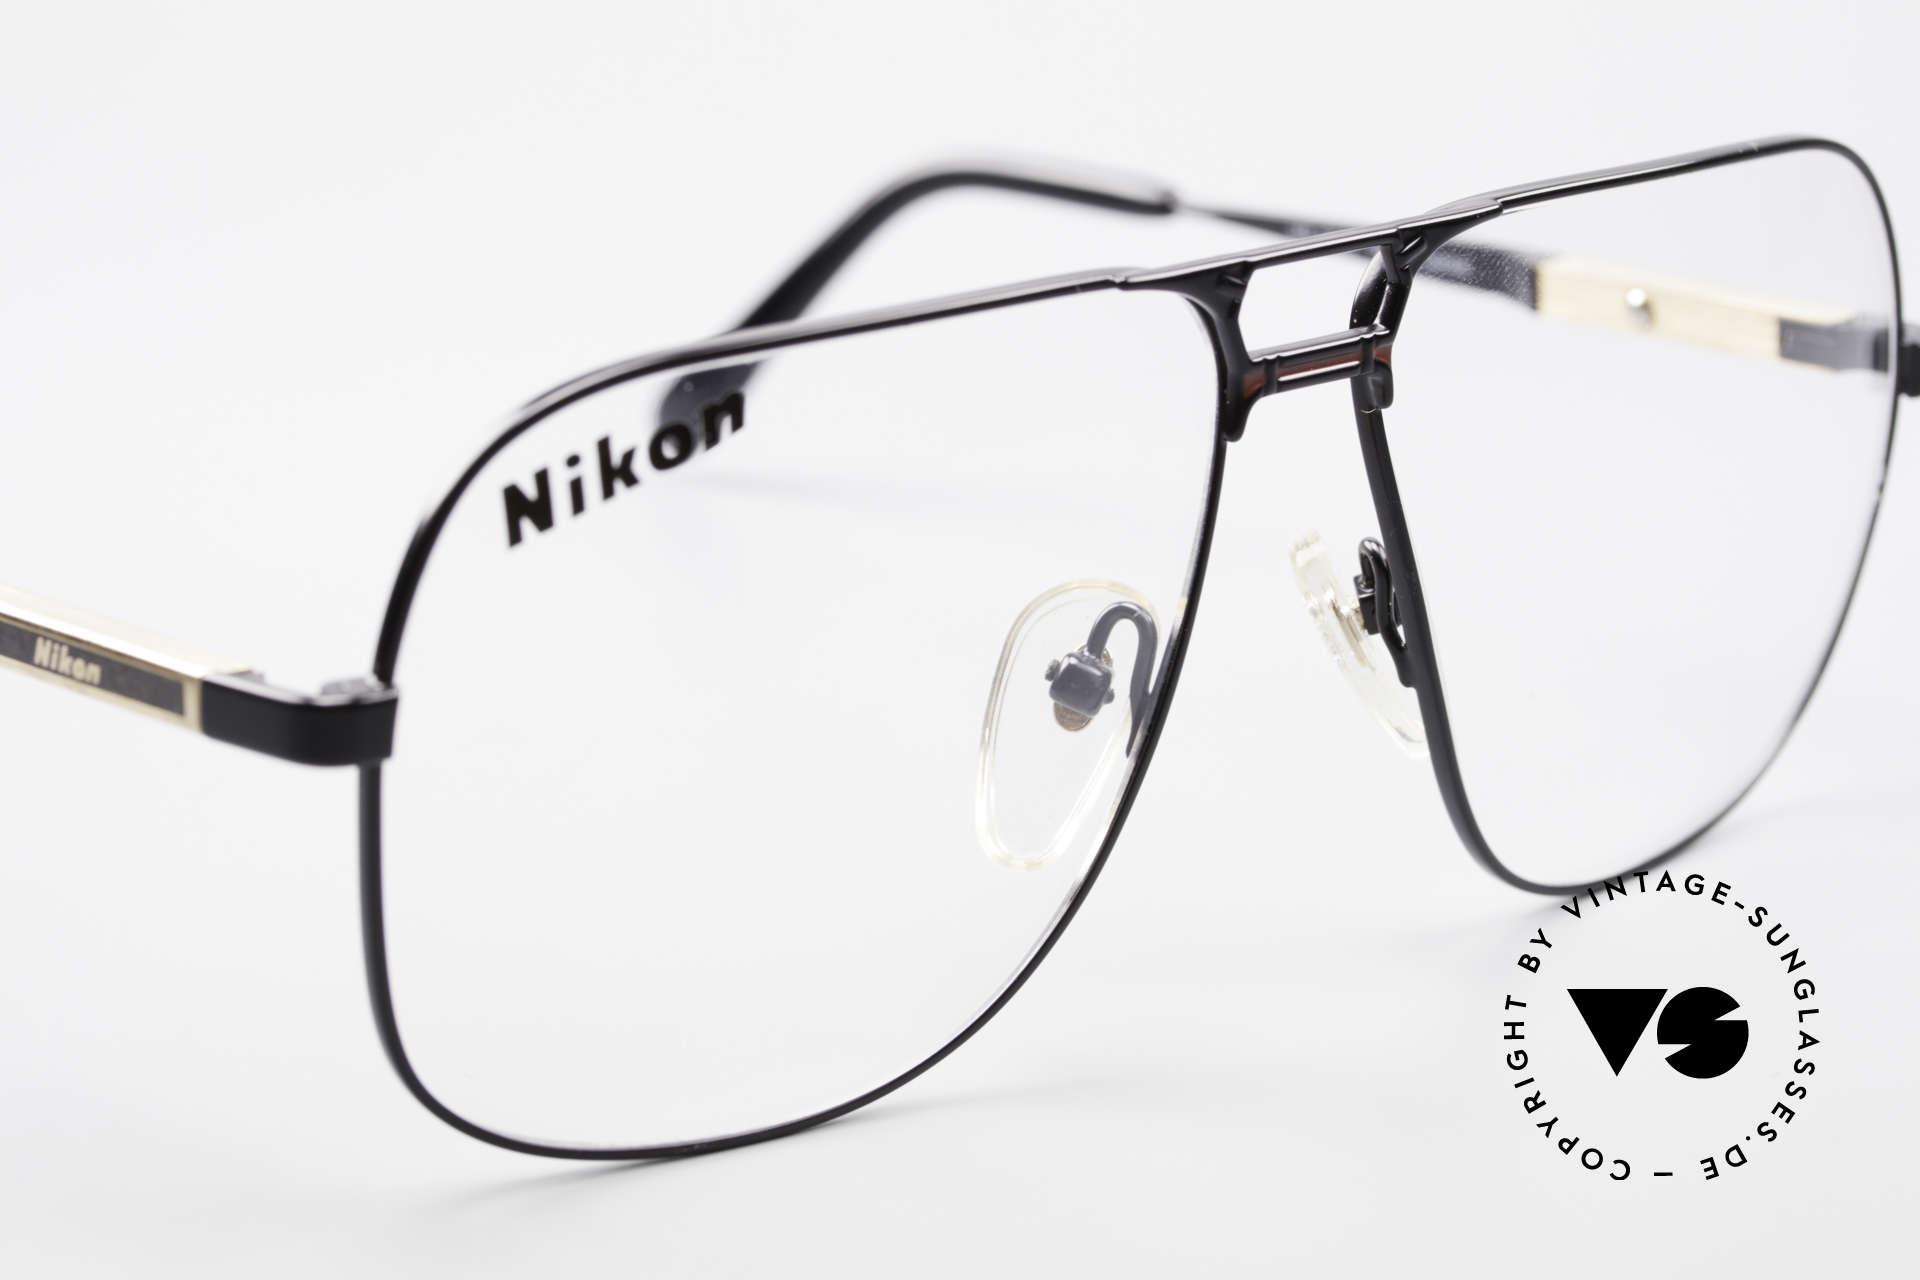 Nikon NK4520 80's XXL Vintage Men's Frame, NO RETRO eyewear, but a 30 years old genuine rarity, Made for Men